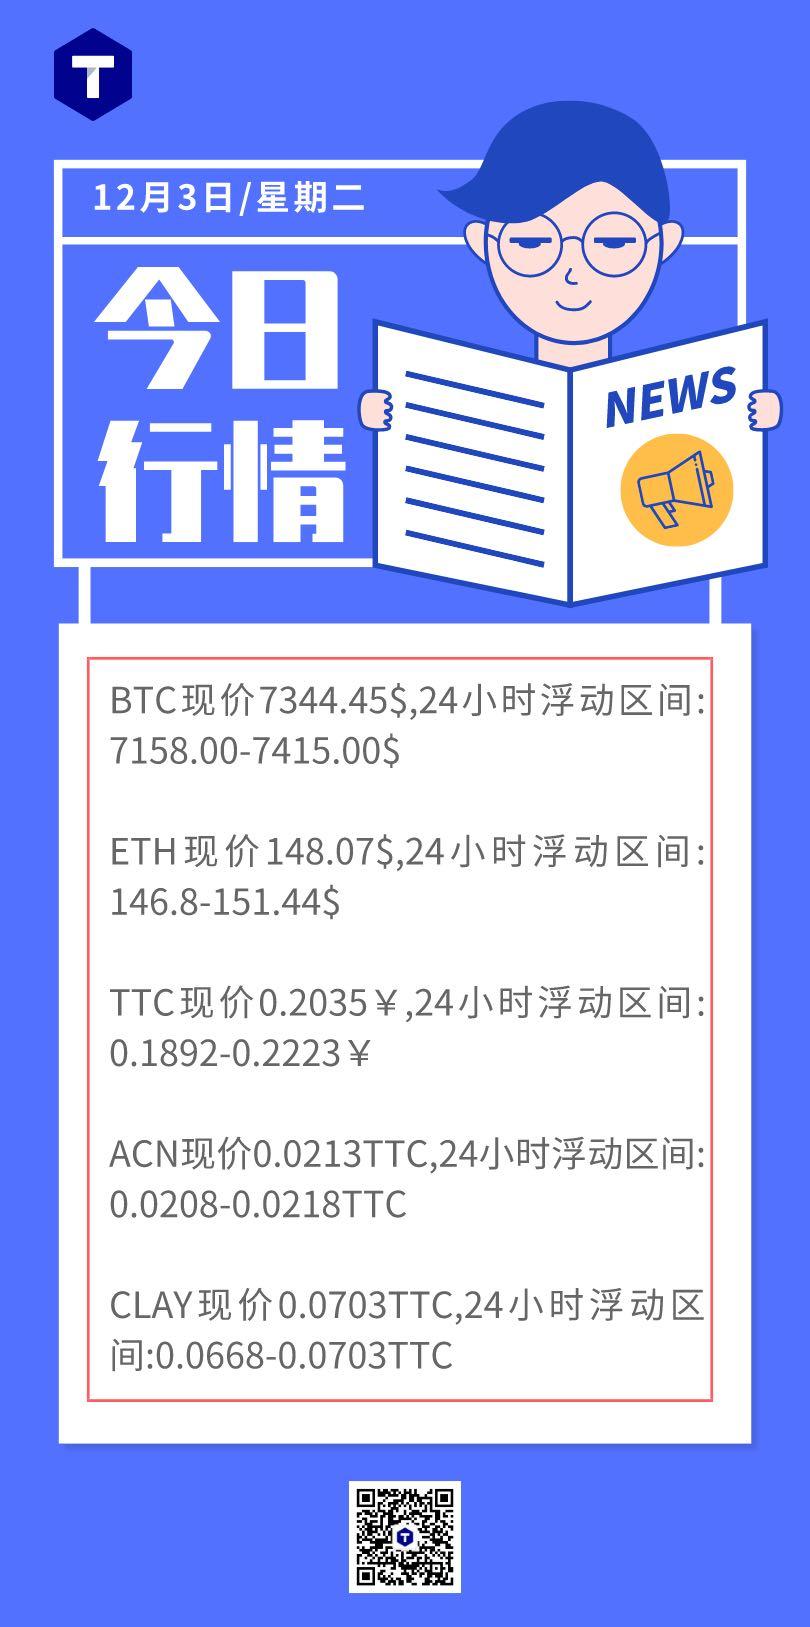 TTC 今日资讯 2019/12/03 星期二